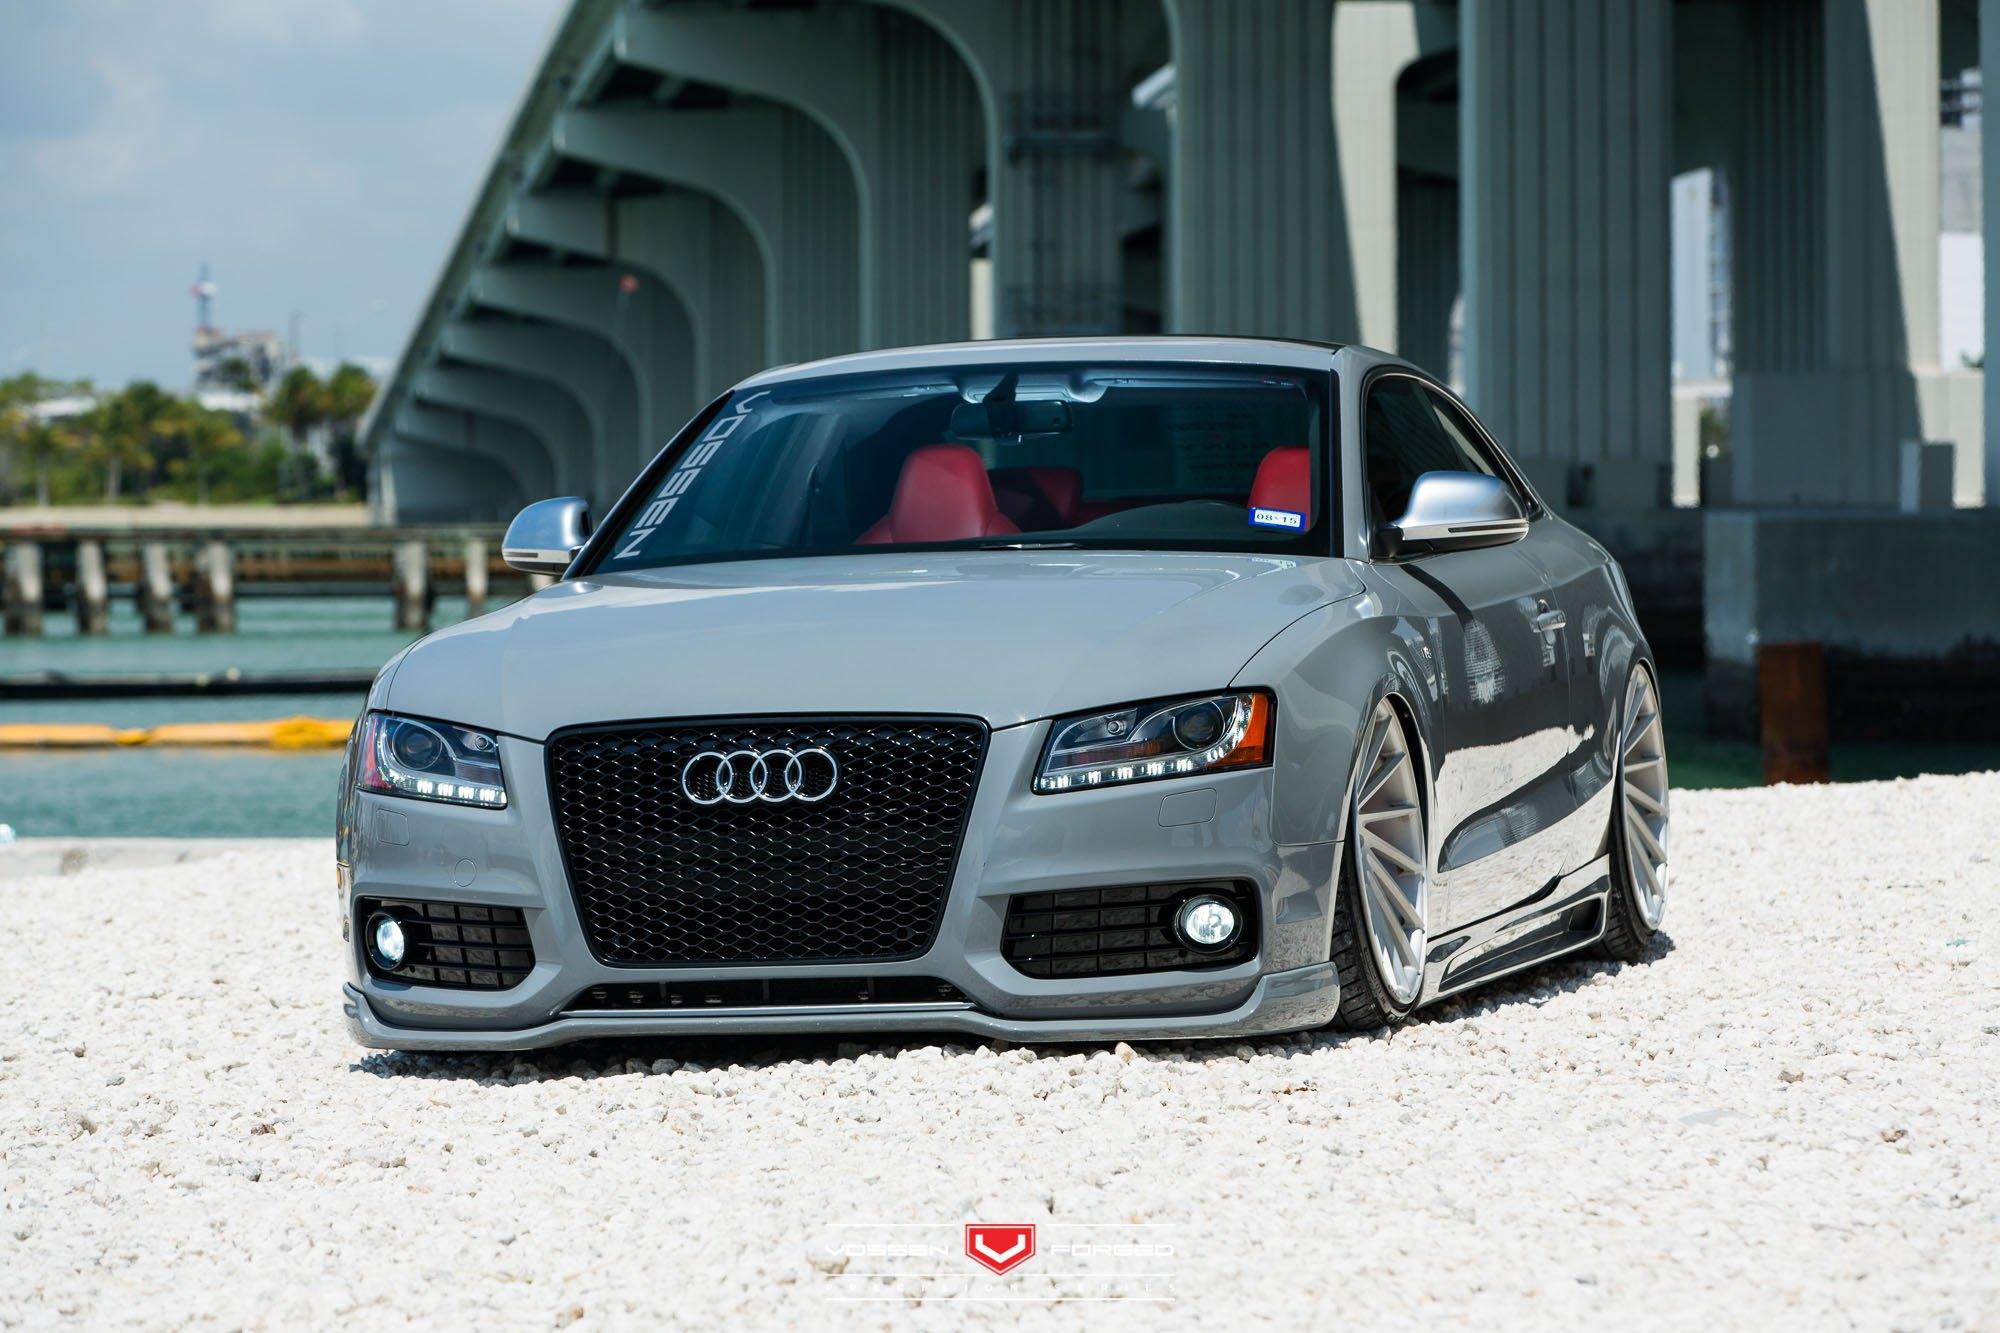 Audi S Sitting Low On Vossen VPS Custom Wheels CARiDcom Gallery - Audi s5 custom